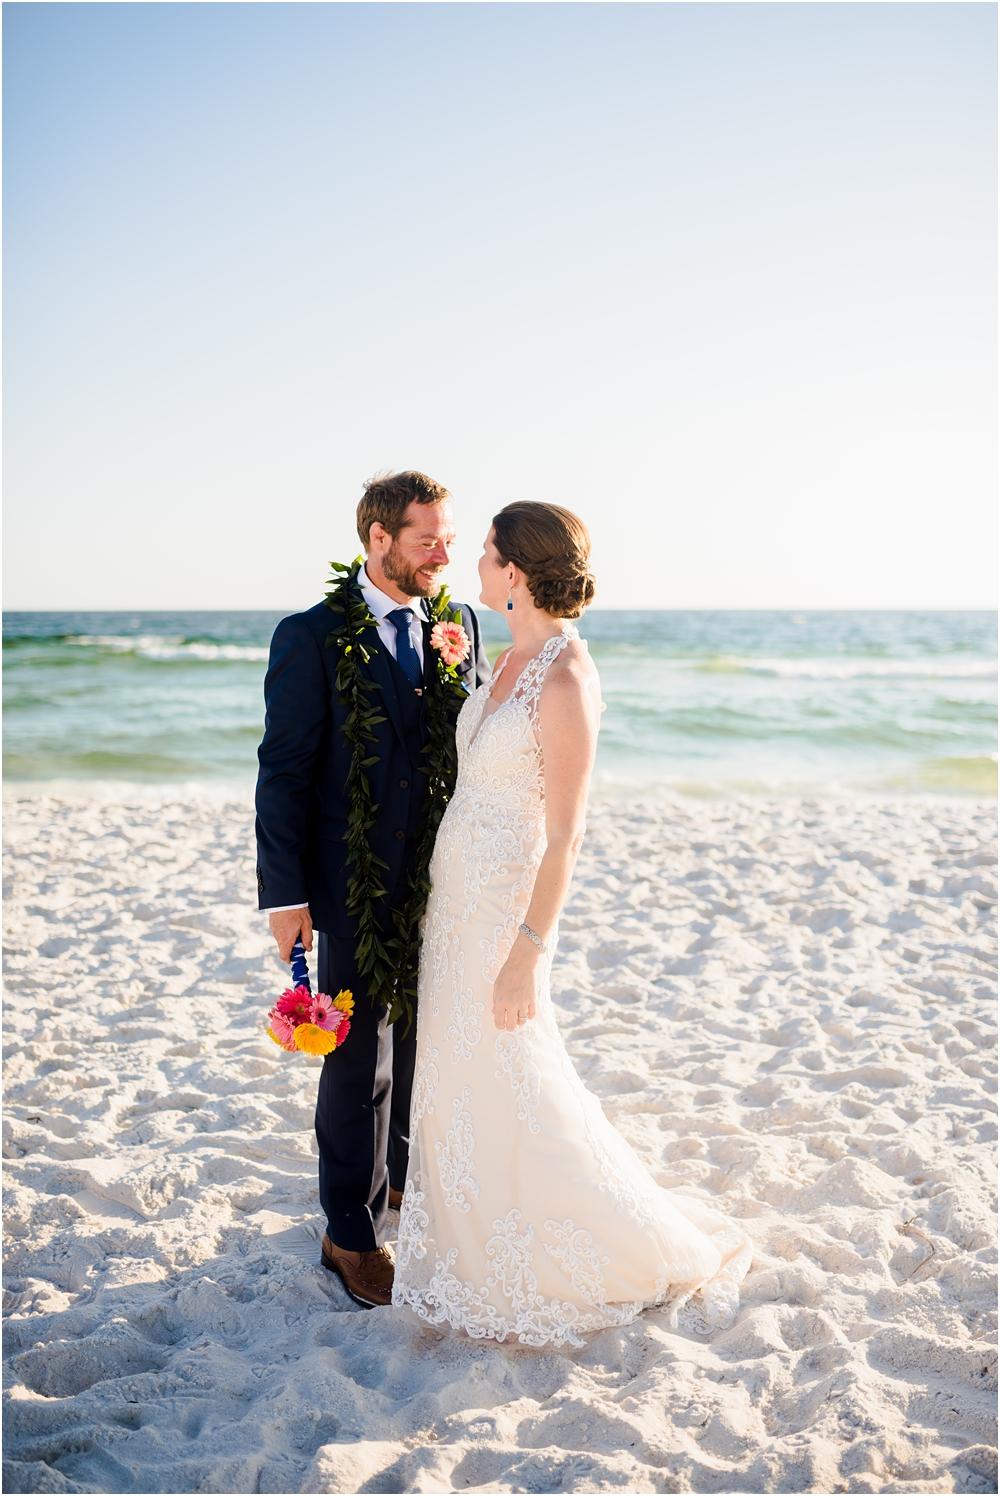 ledman-wedding-kiersten-stevenson-photography-30a-panama-city-beach-dothan-tallahassee-(280-of-763).JPG